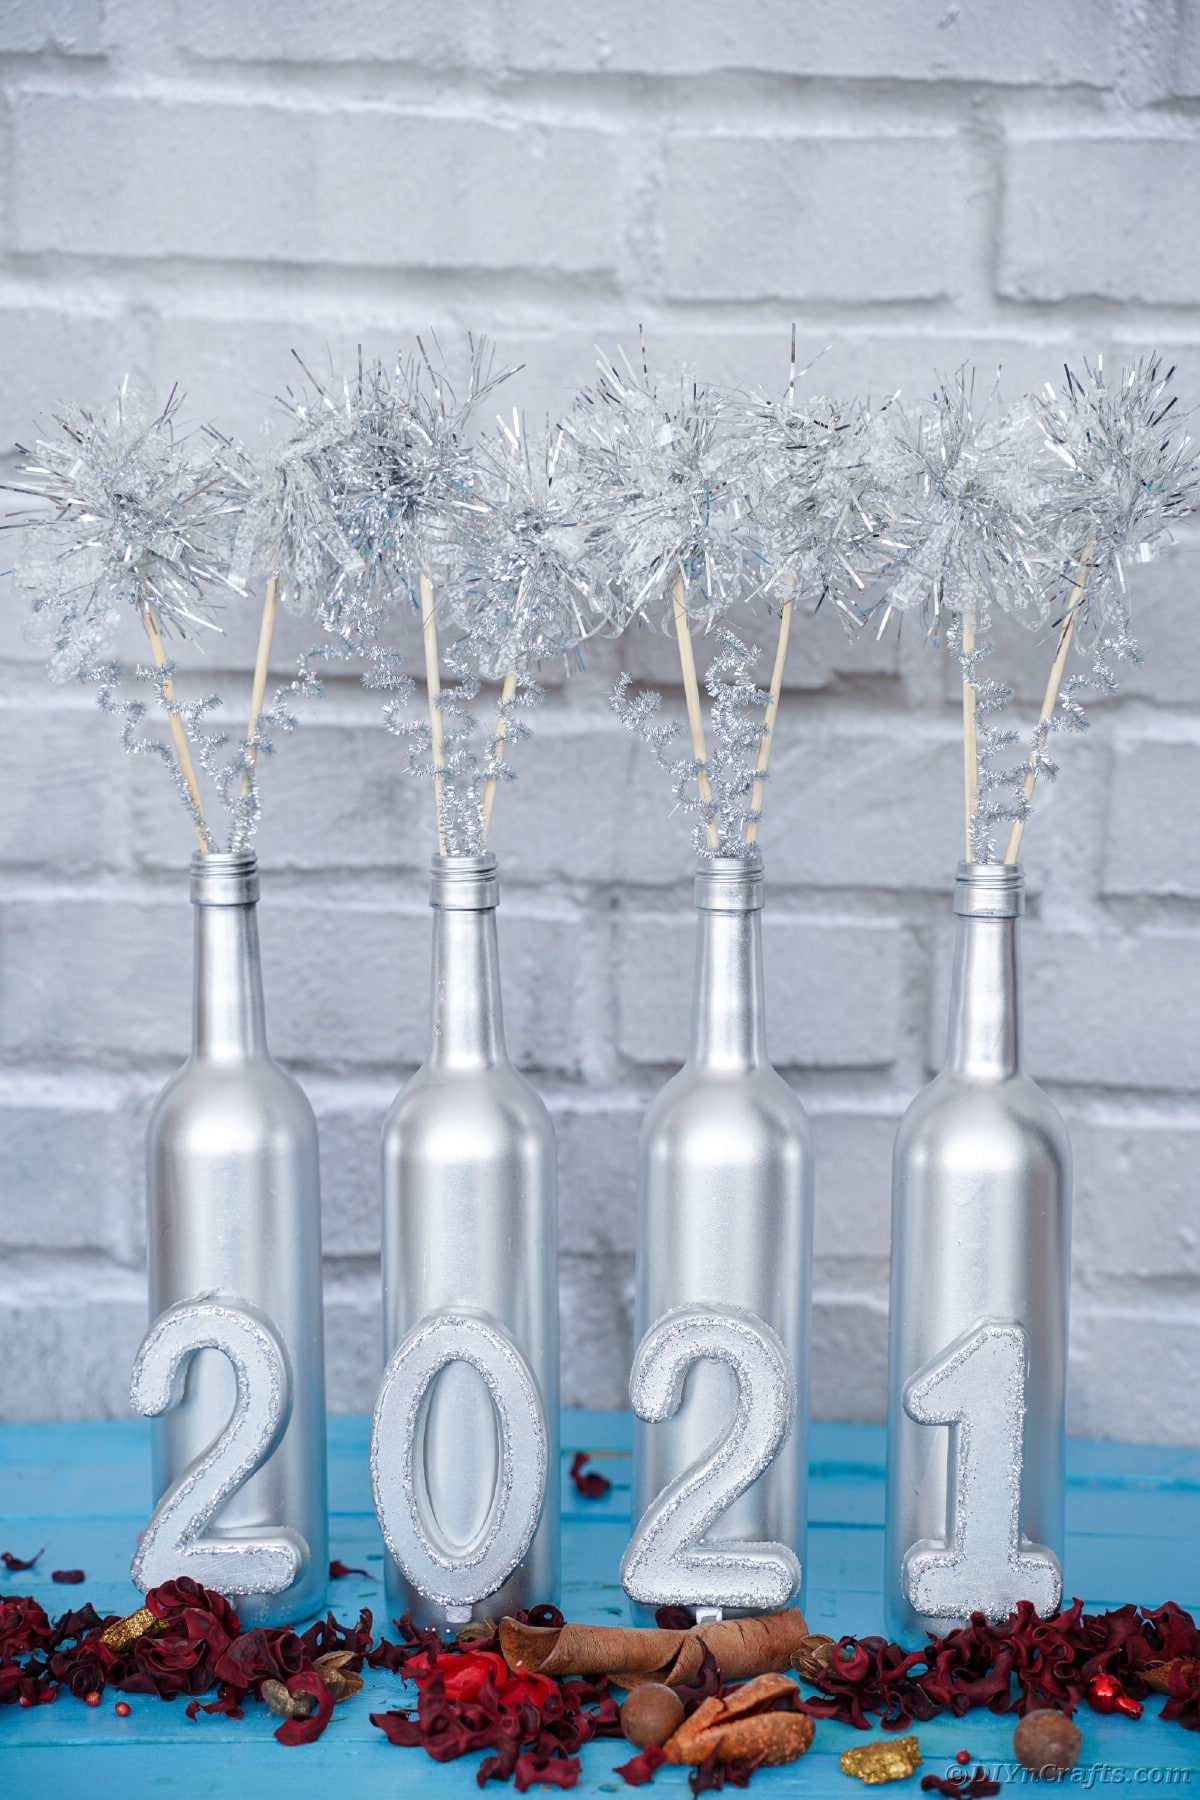 Silver wine bottle decoration by white brick